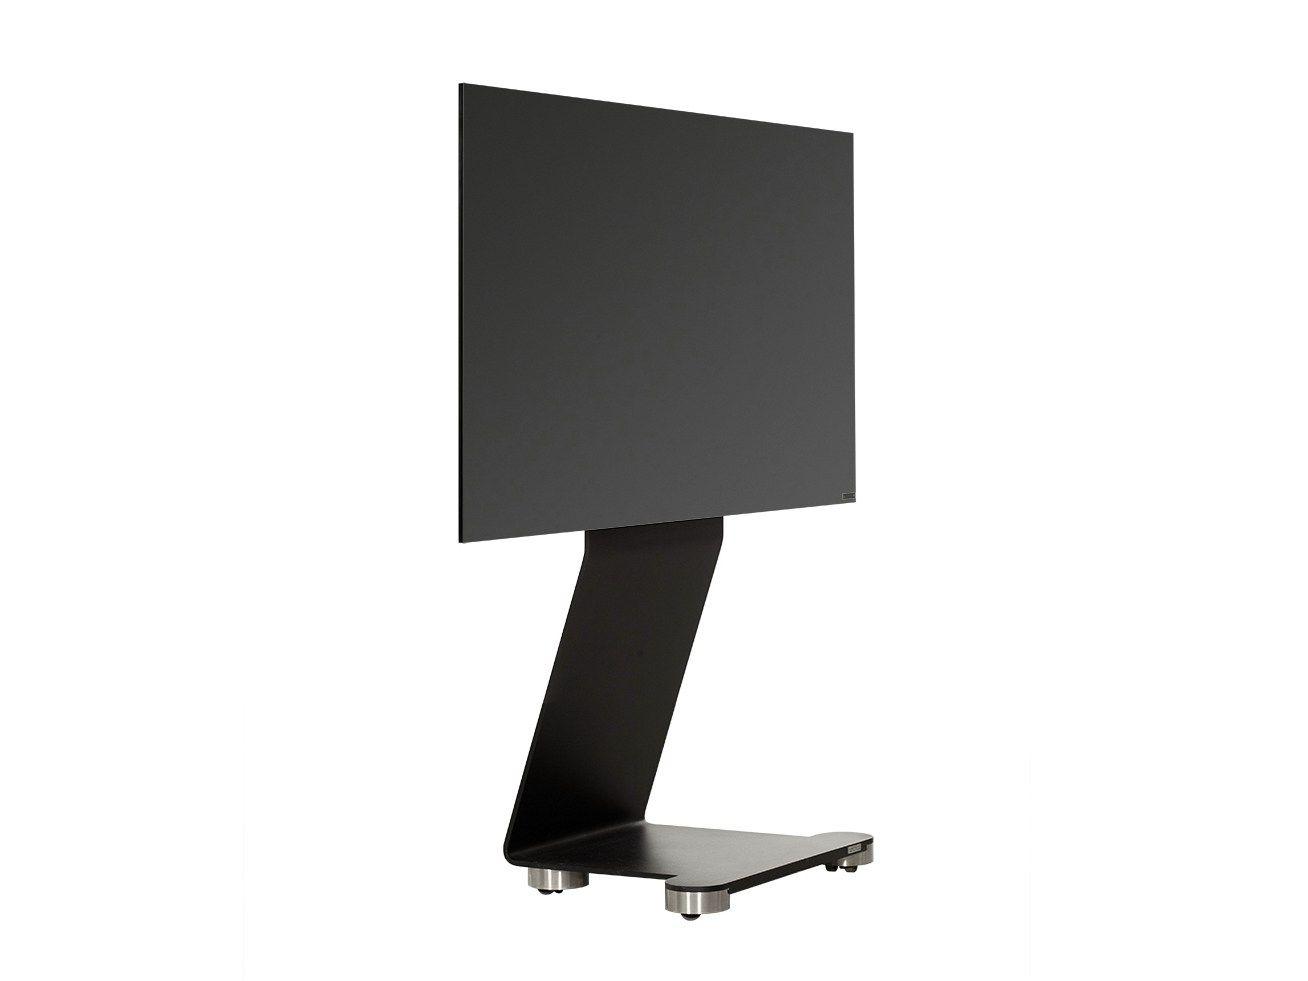 120 Meuble Tv Tvs # Meuble Tv Haut Design